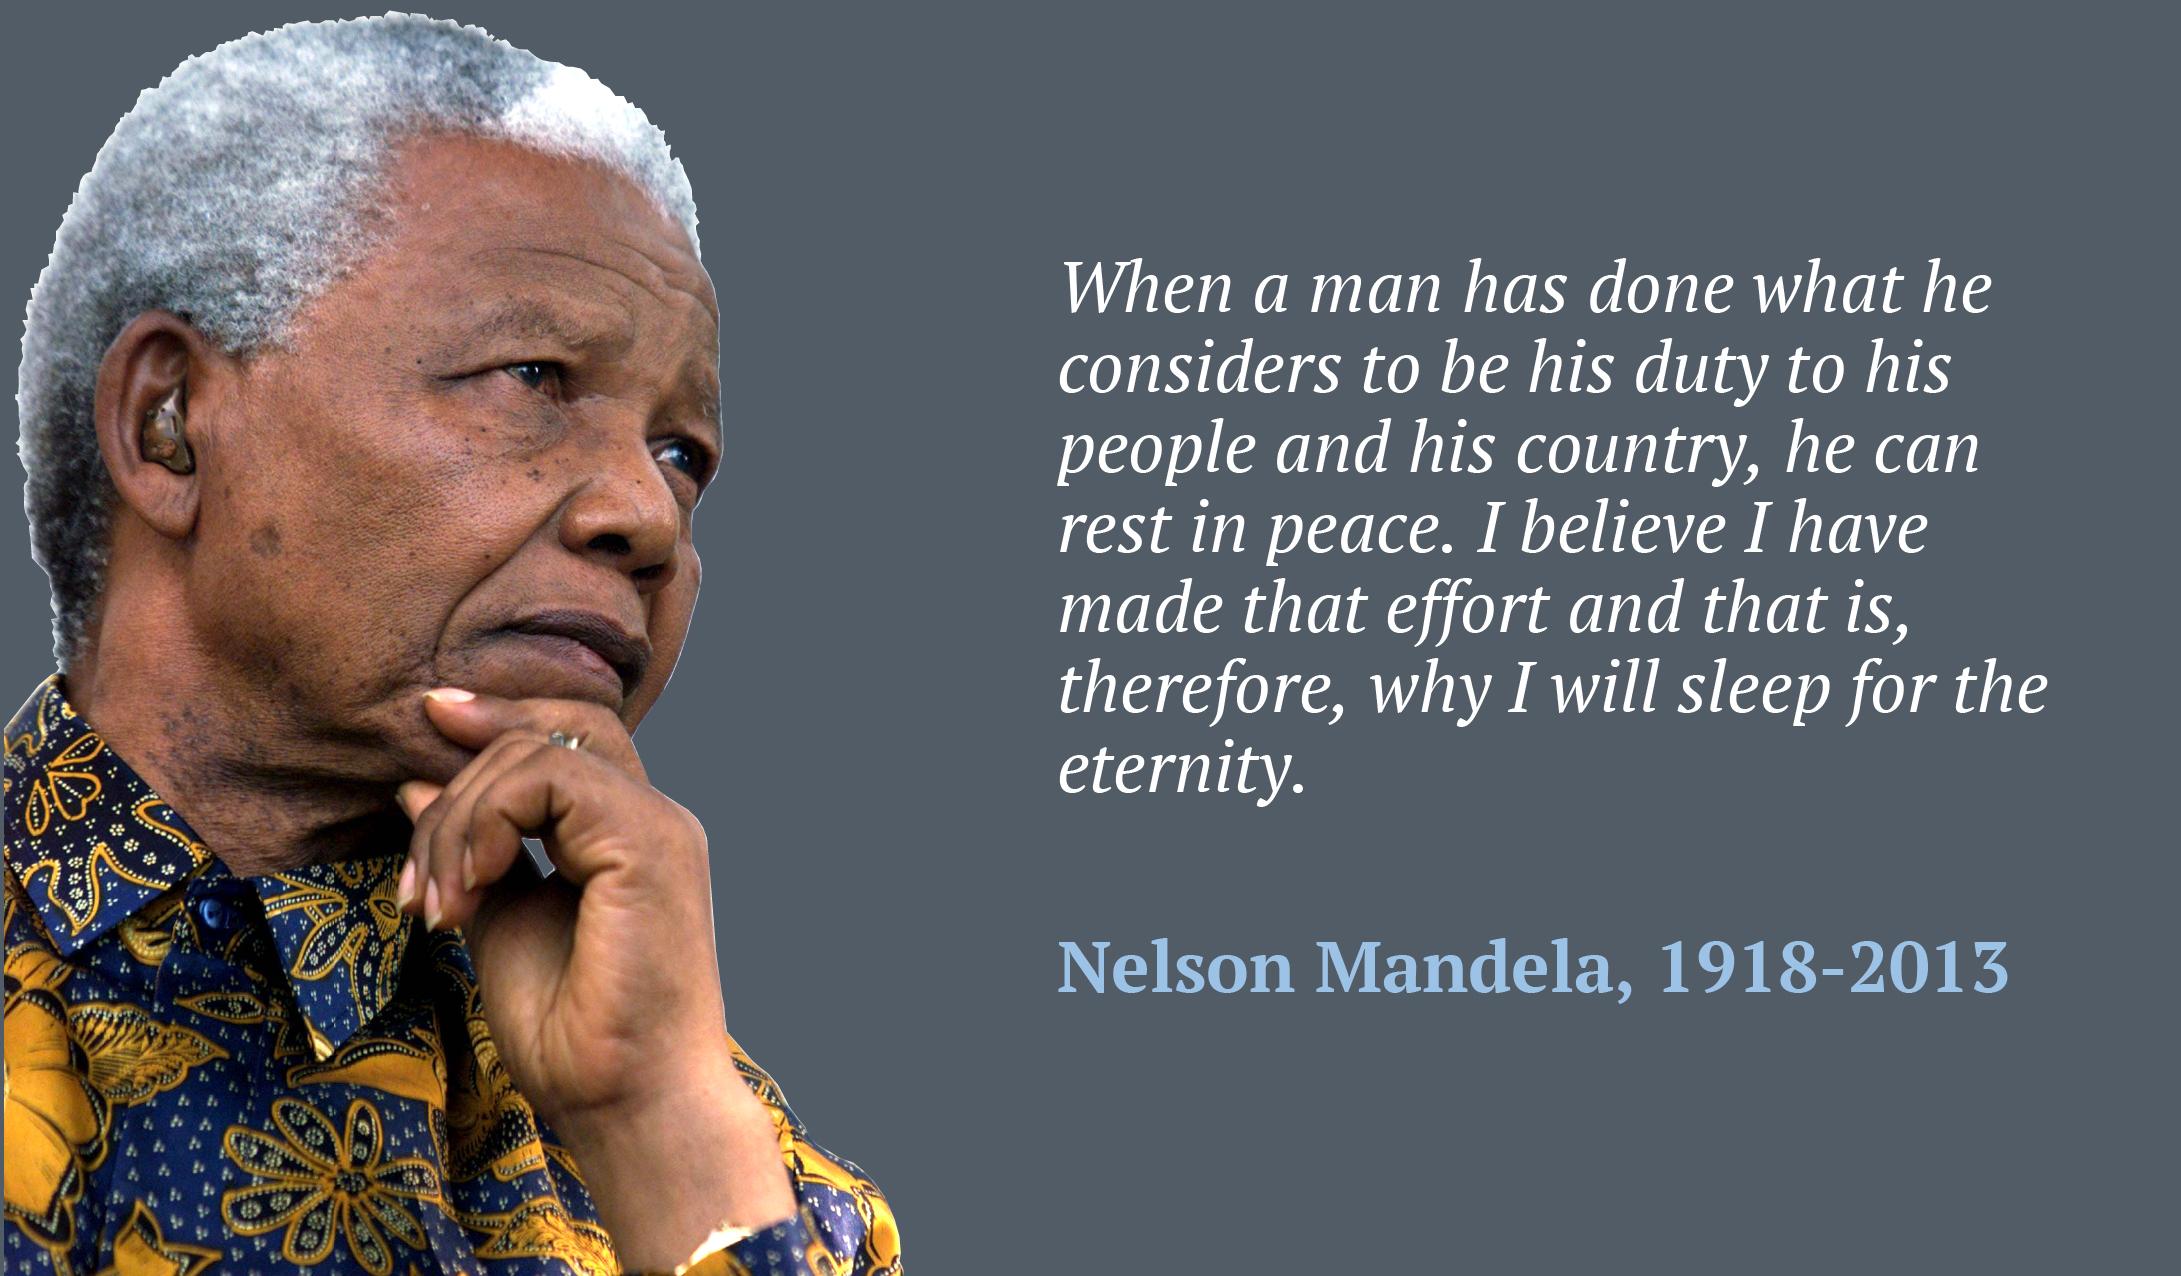 Nelson Mandela Personality Essay